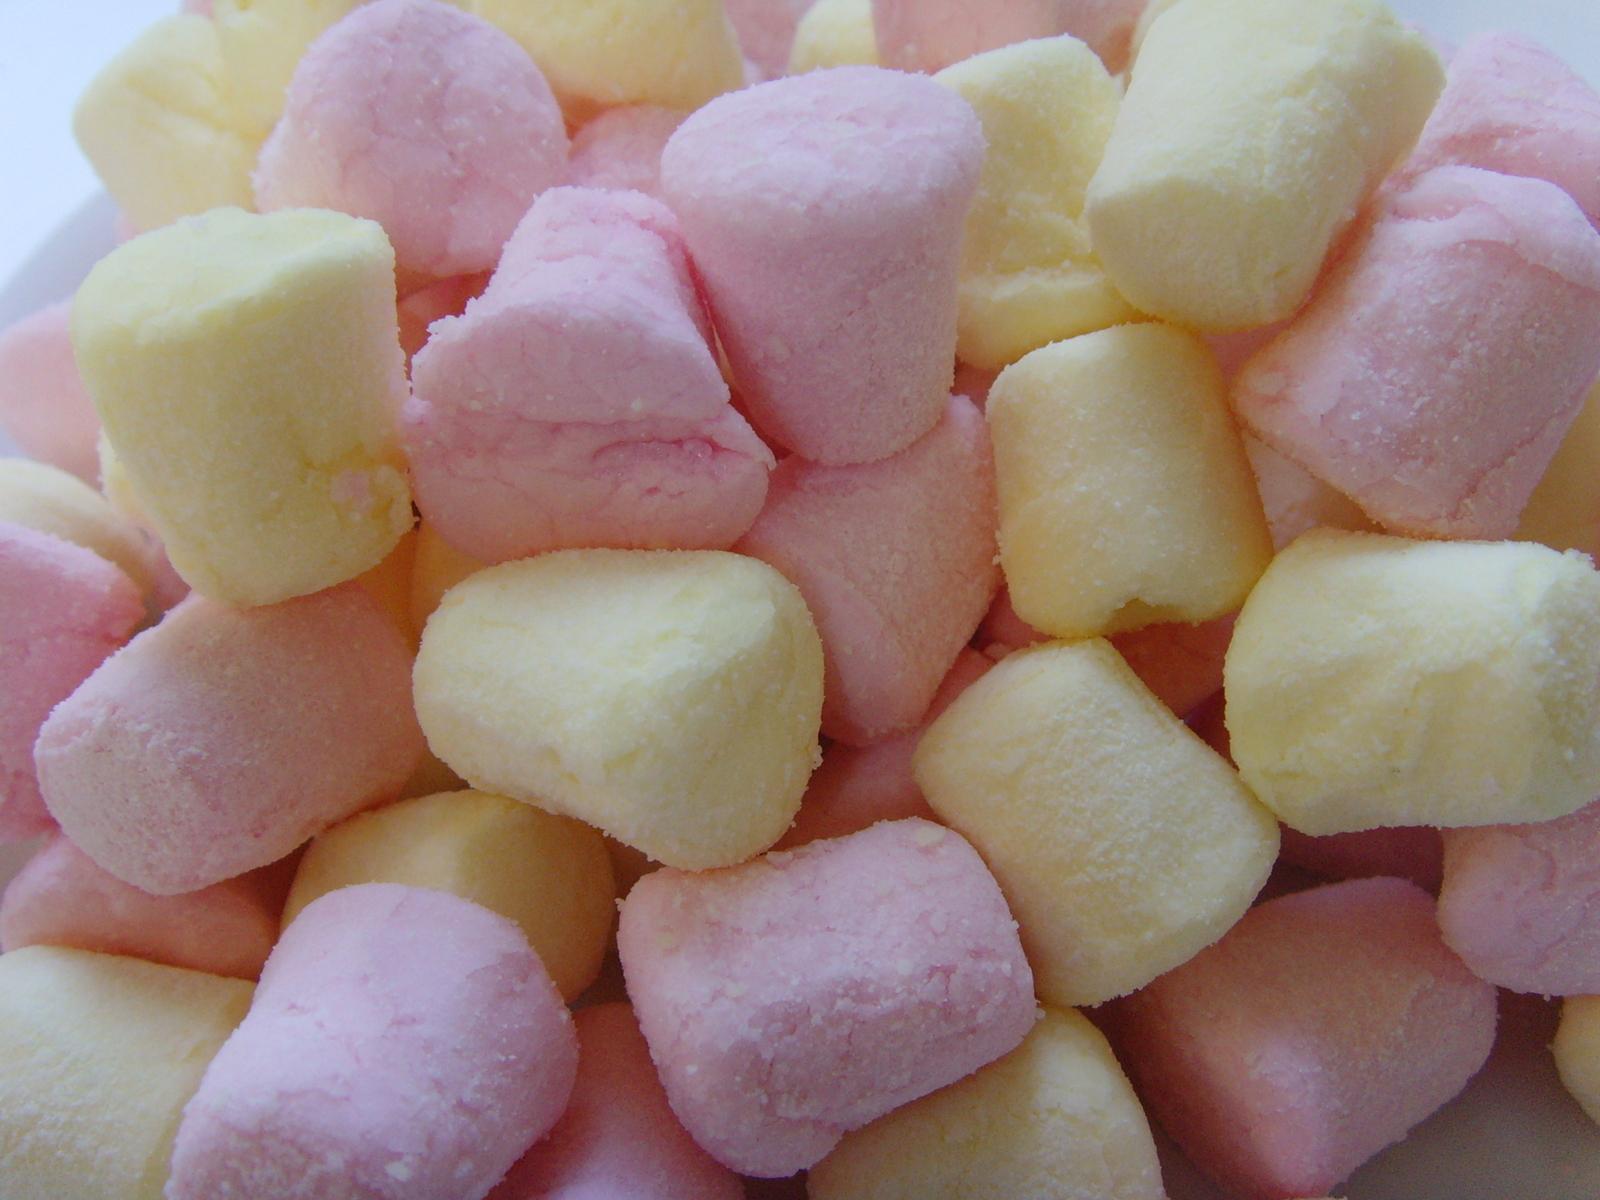 mini-marshmallows-1323047-1600x1200